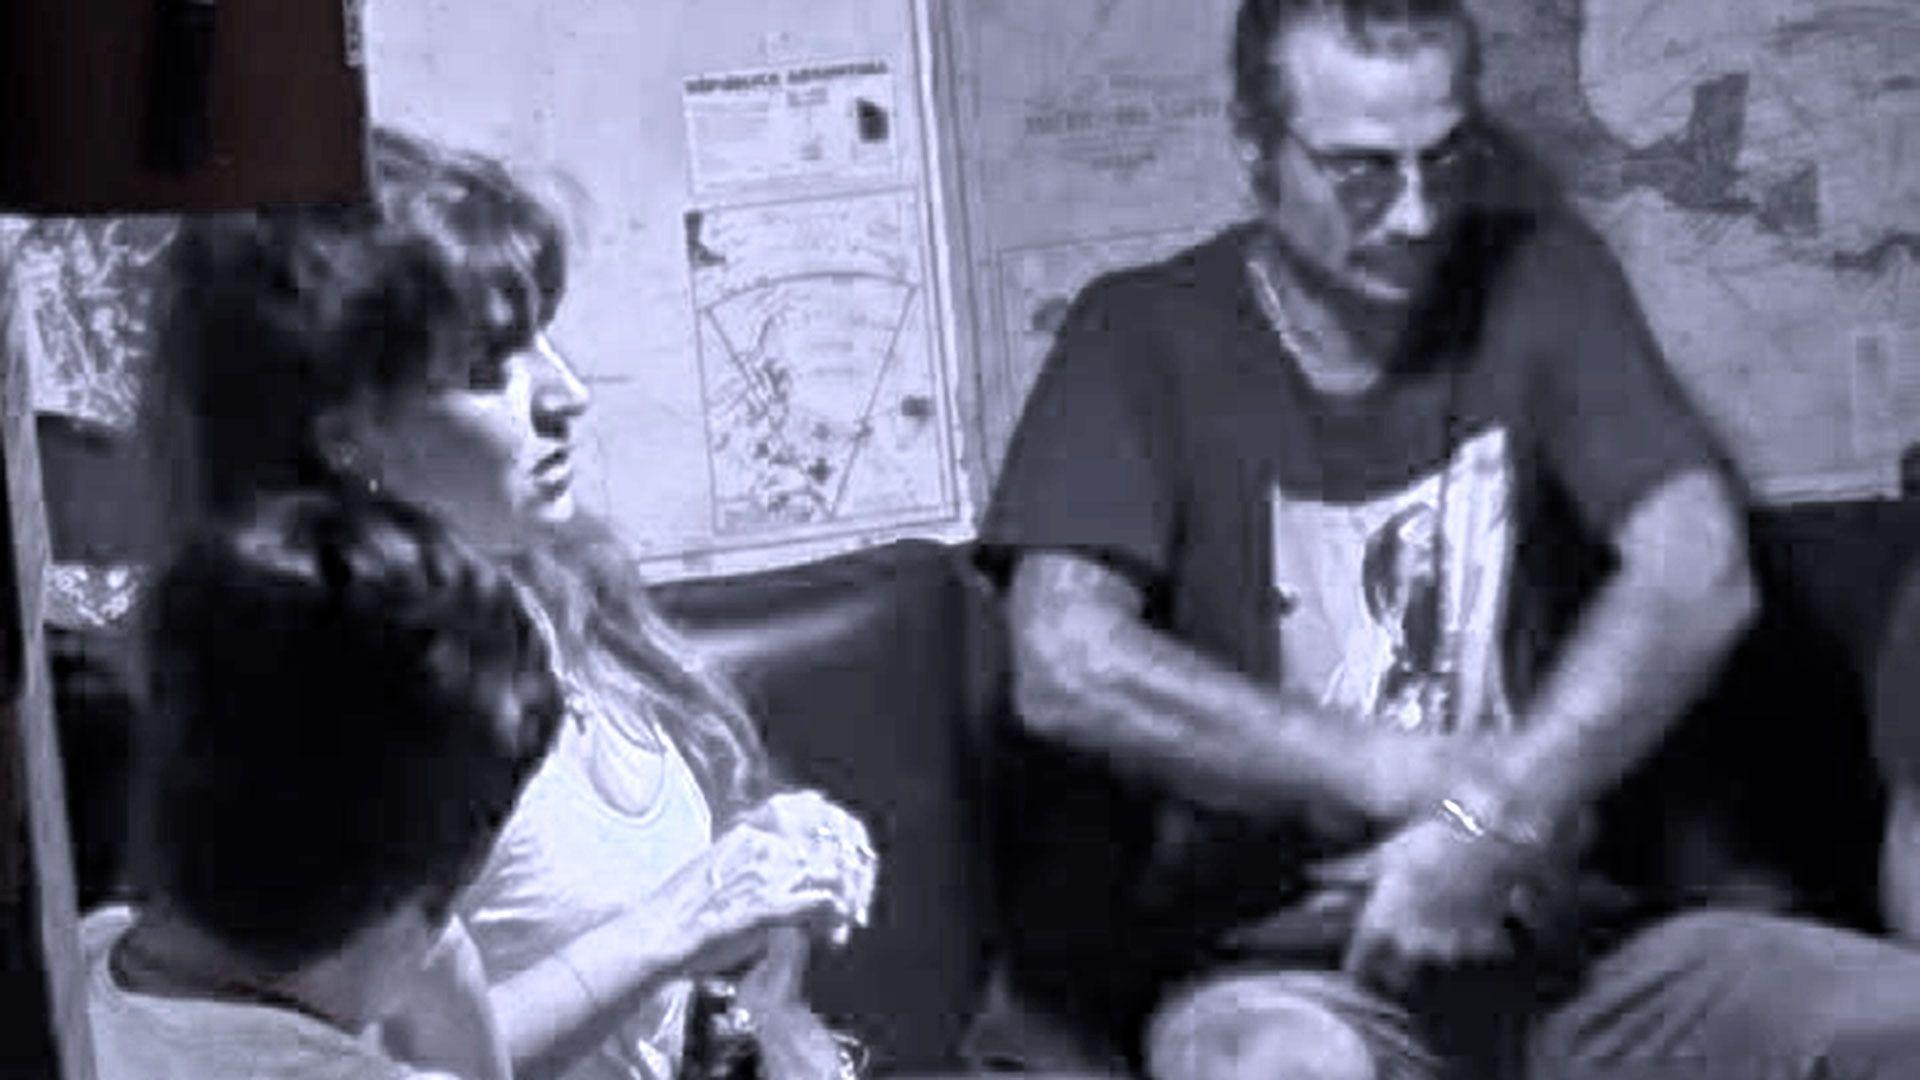 Gianinna-Maradona-y-Daniel-Osvaldo